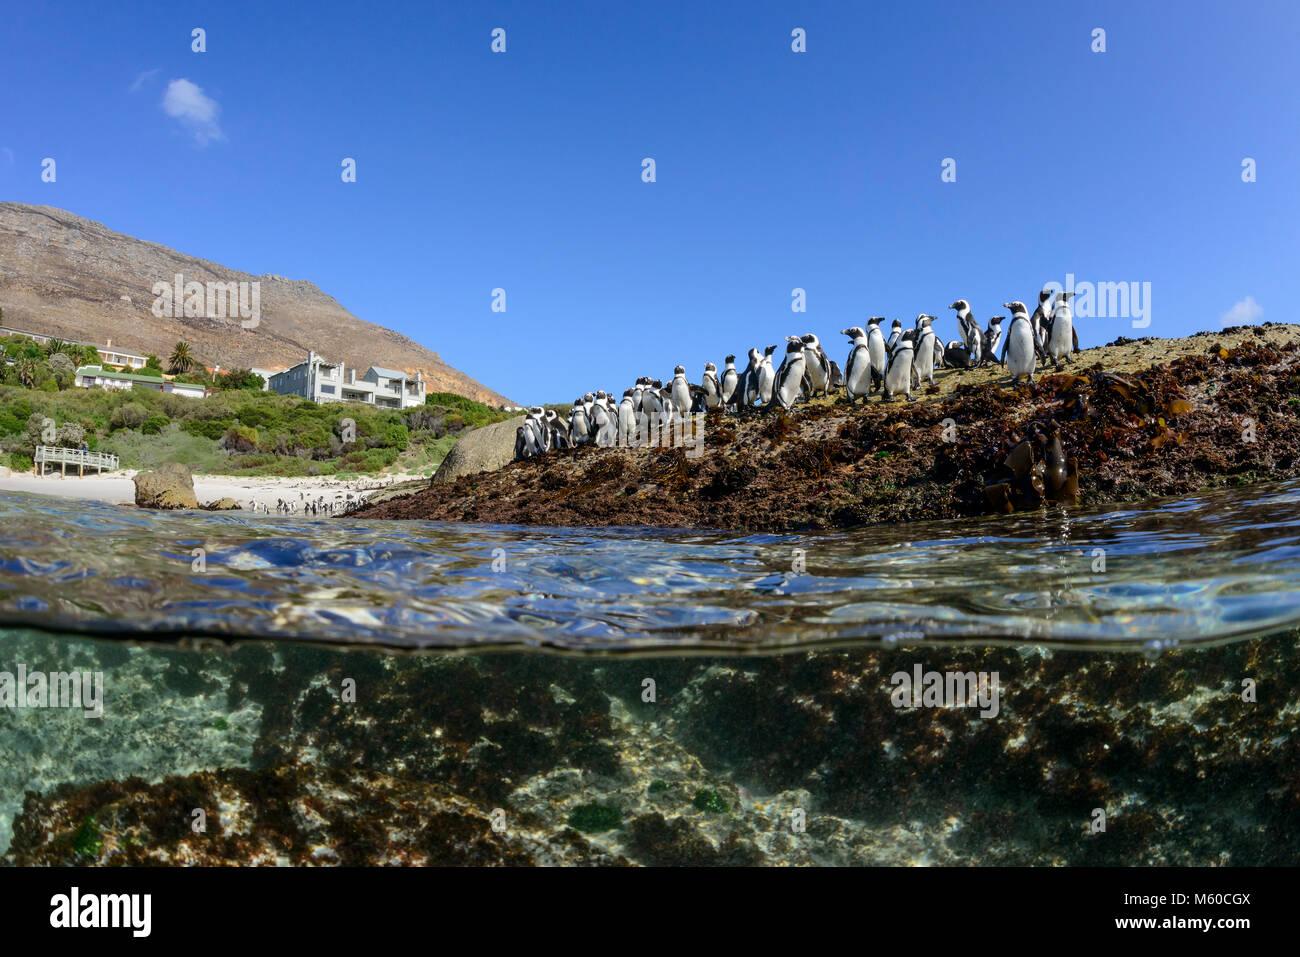 Jackass Penguin, African Penguin (Spheniscus demersus). Group standing on the shore, splitlevel picture. Simons - Stock Image